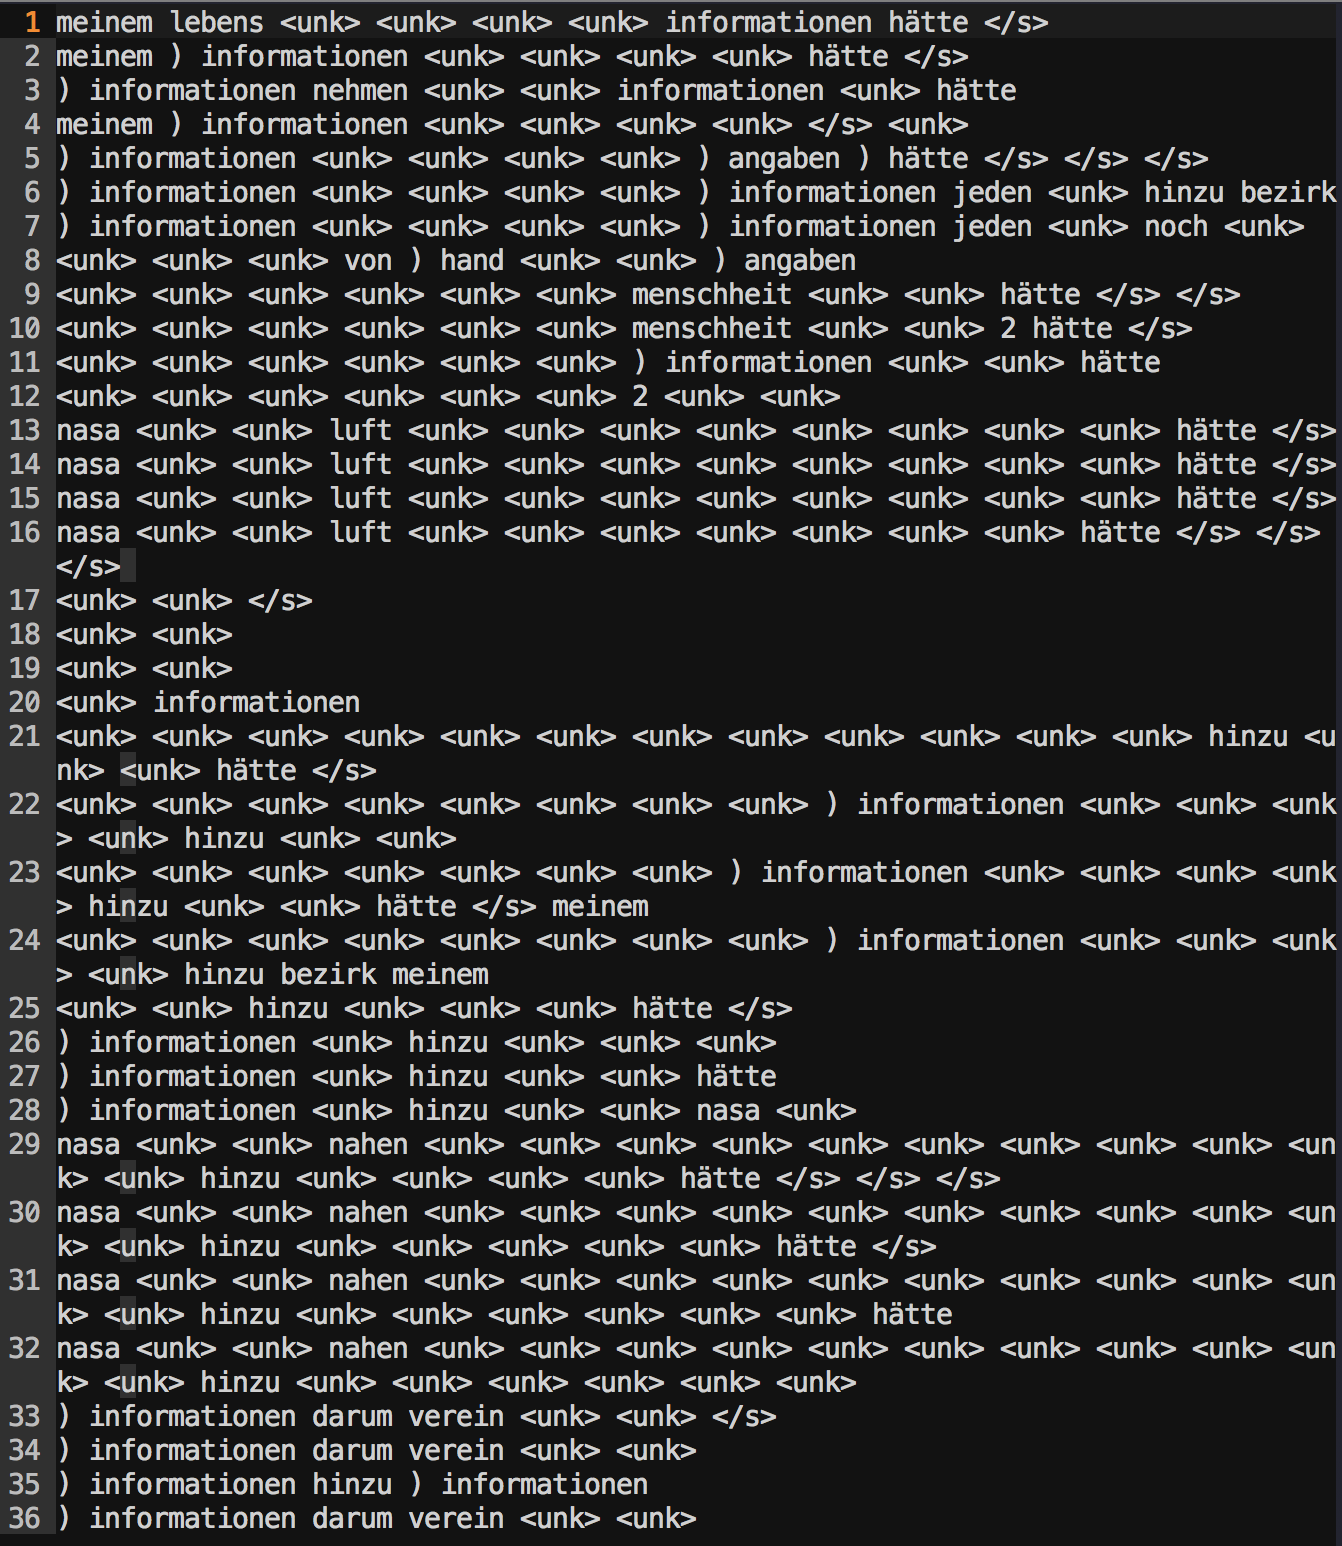 KeyError on testing · Issue #59 · jadore801120/attention-is